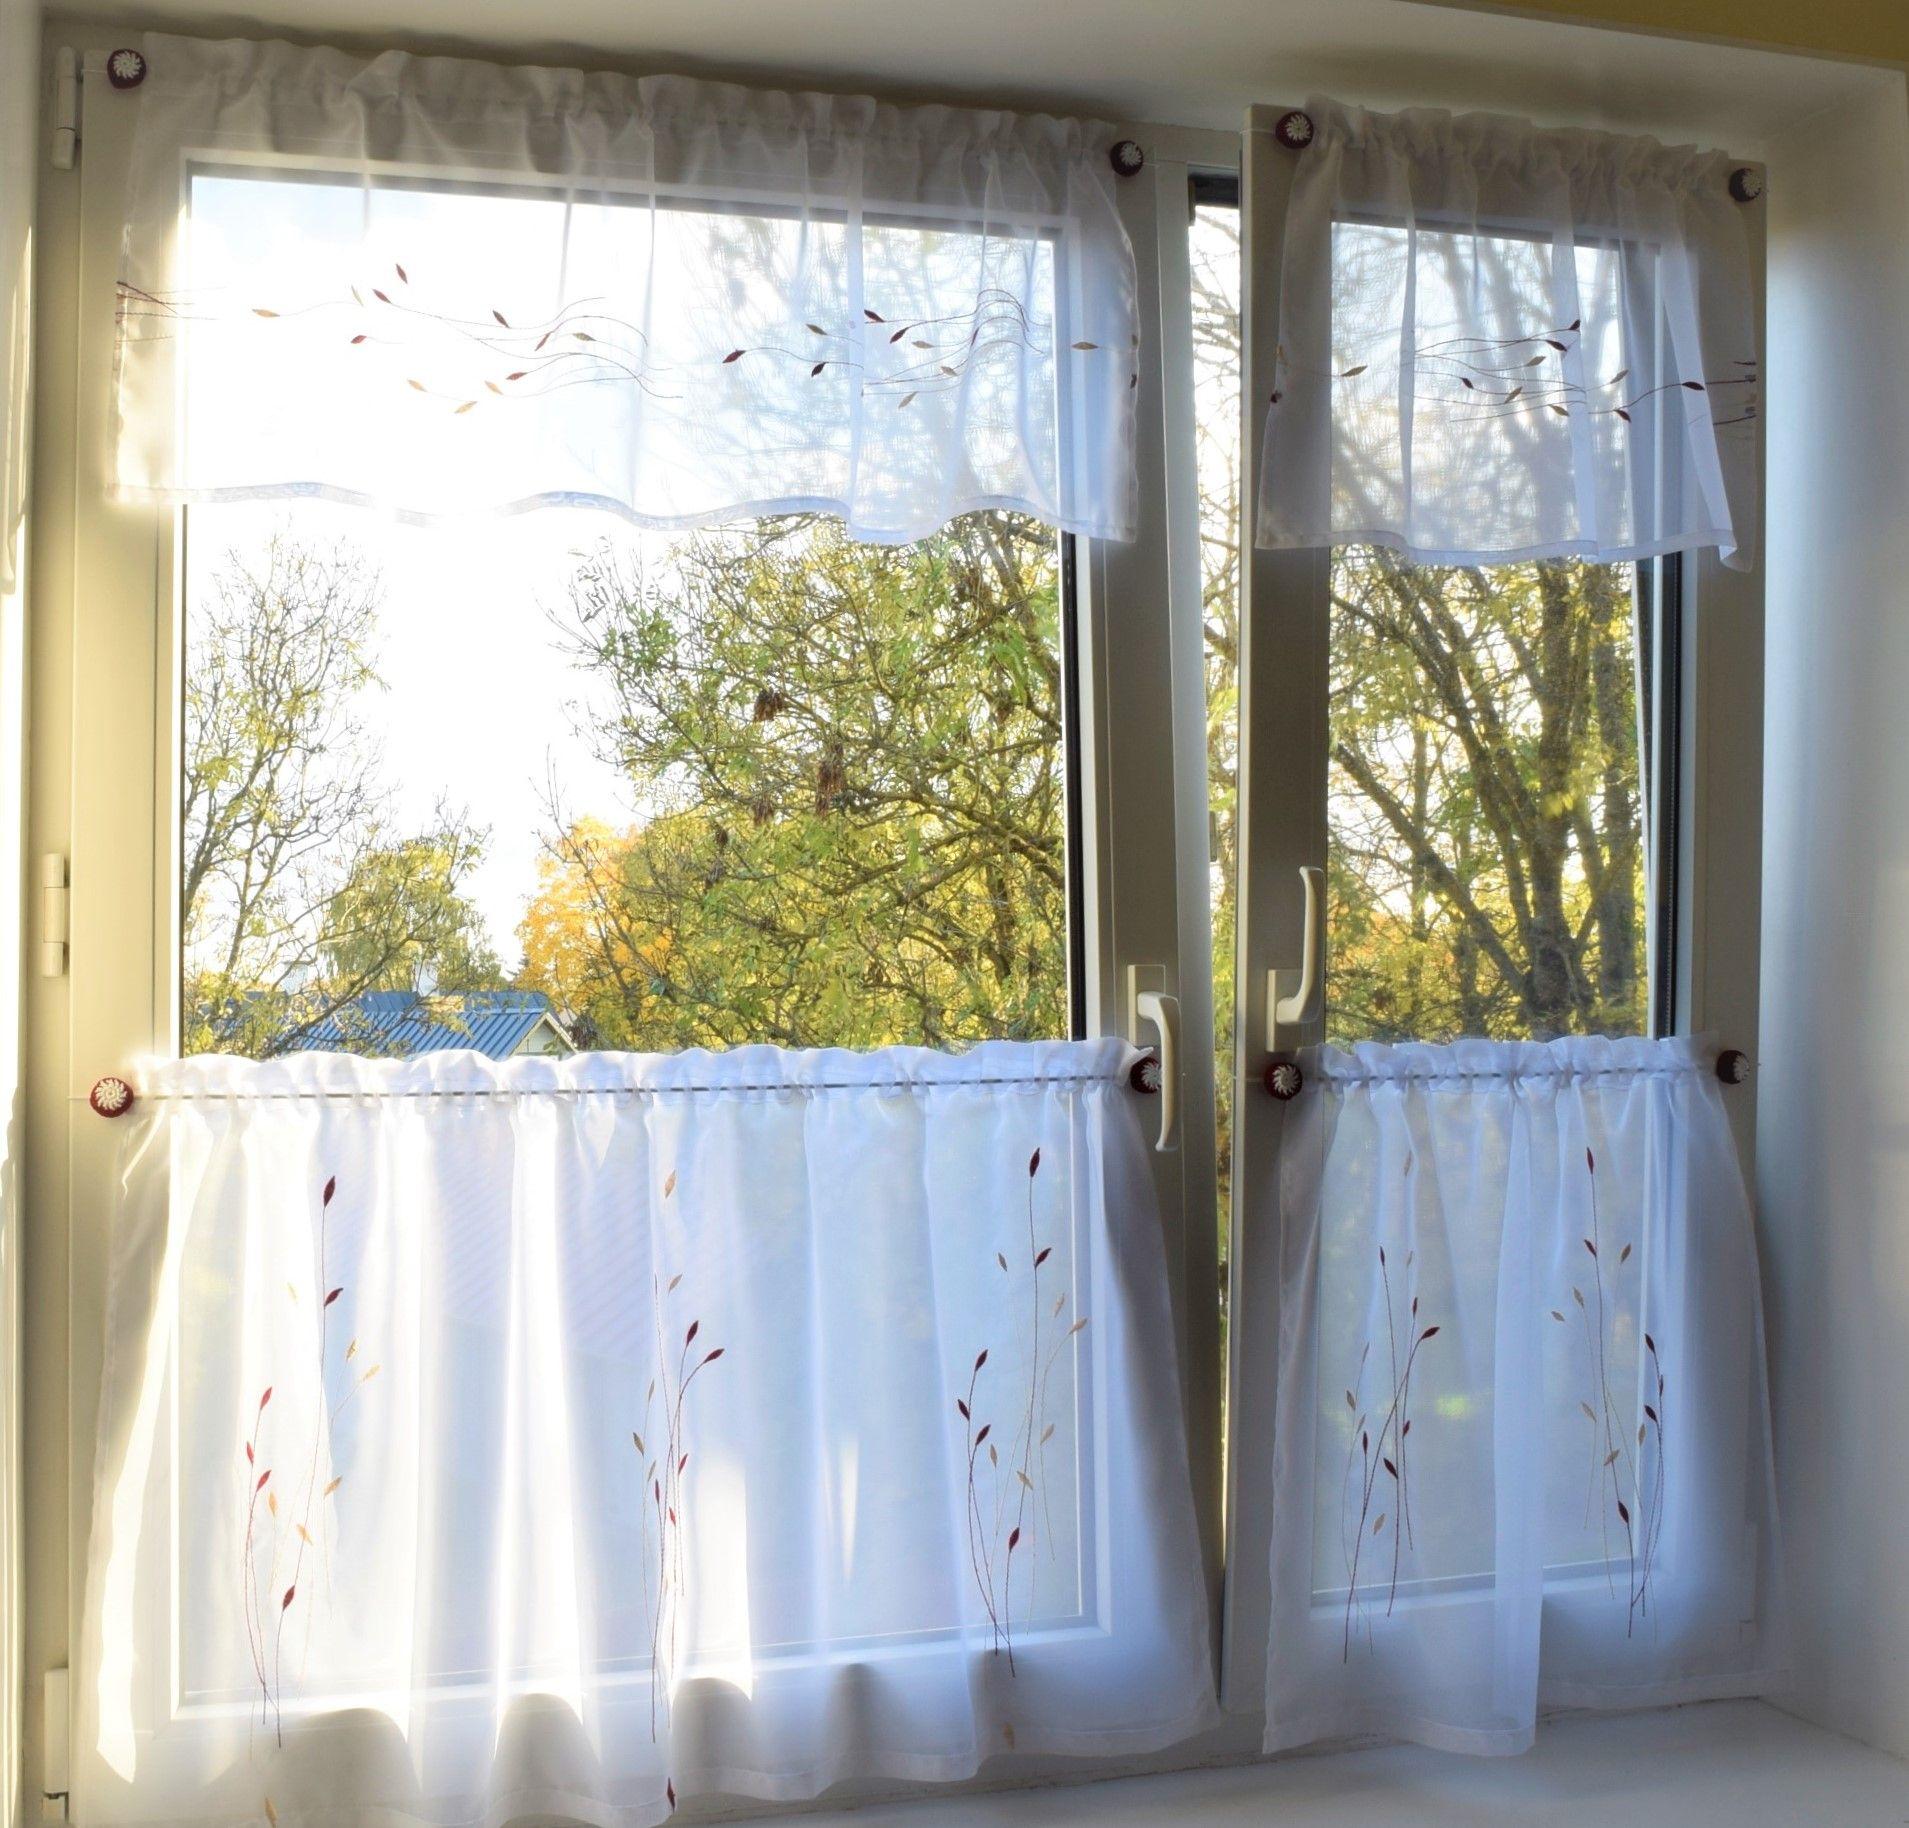 gardinenstange ohne bohren scheibengardinen k chengardinen bistrogardinen pinterest. Black Bedroom Furniture Sets. Home Design Ideas